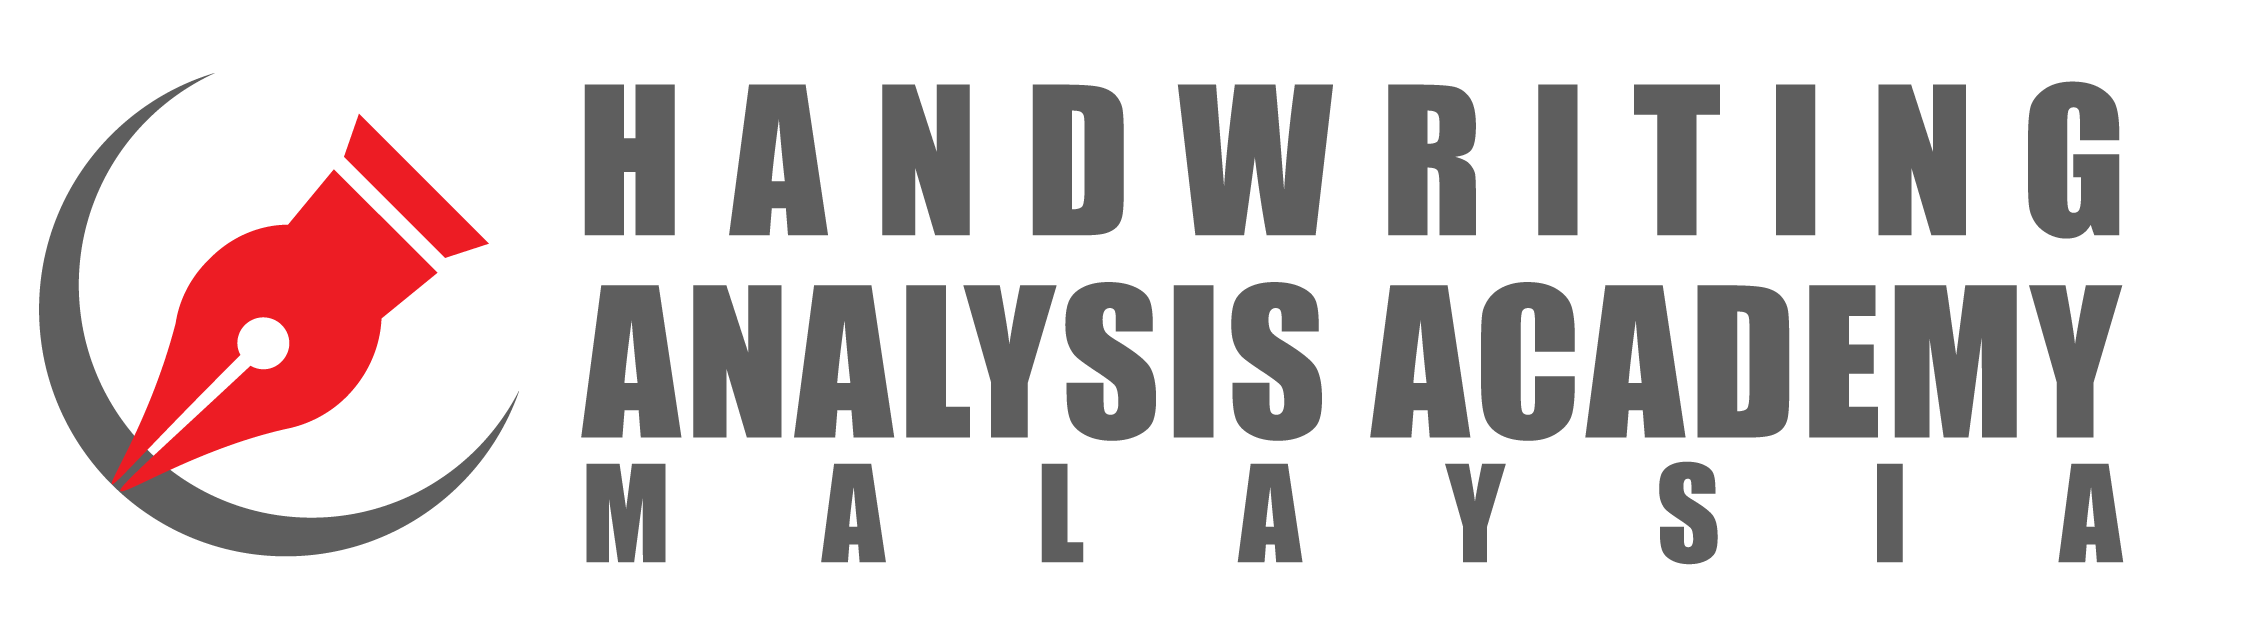 Handwriting Analysis Academy Malaysia (Grafologi Malaysia)